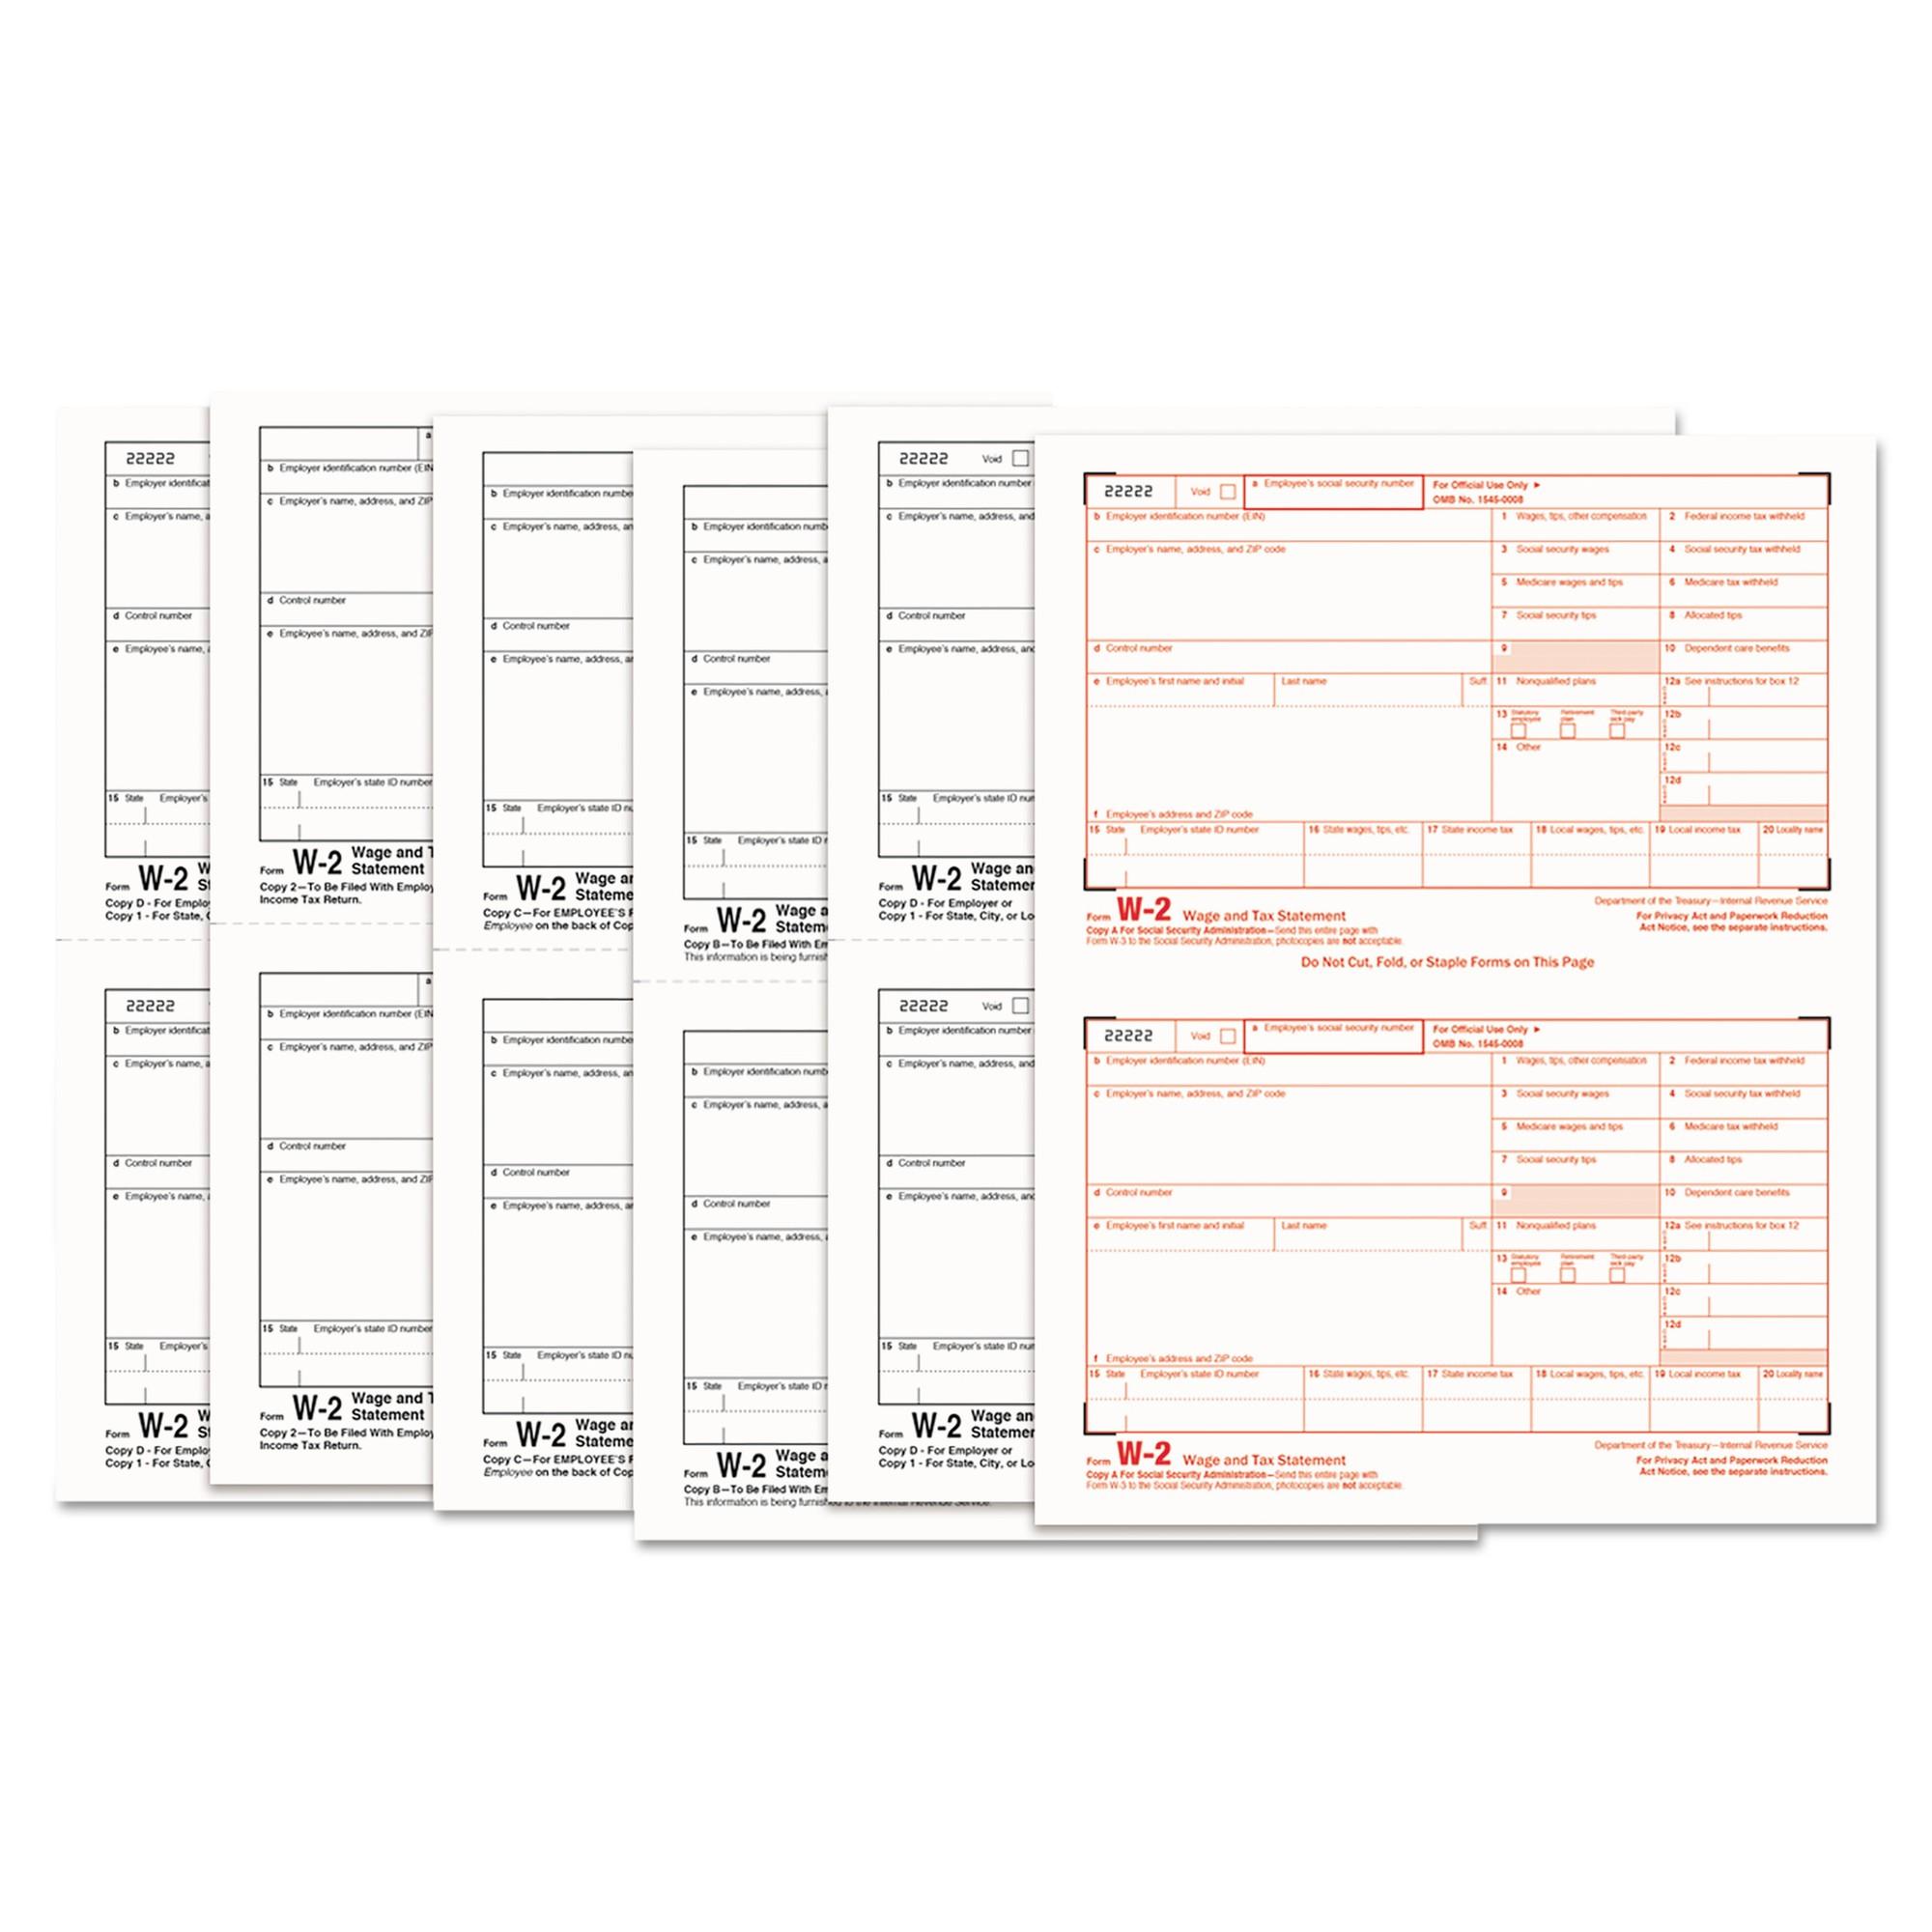 W-2 Tax Forms, 6-Part, 5 1/2 x 8 1/2, Inkjet/Laser, 50 W-2s & 1 W-3